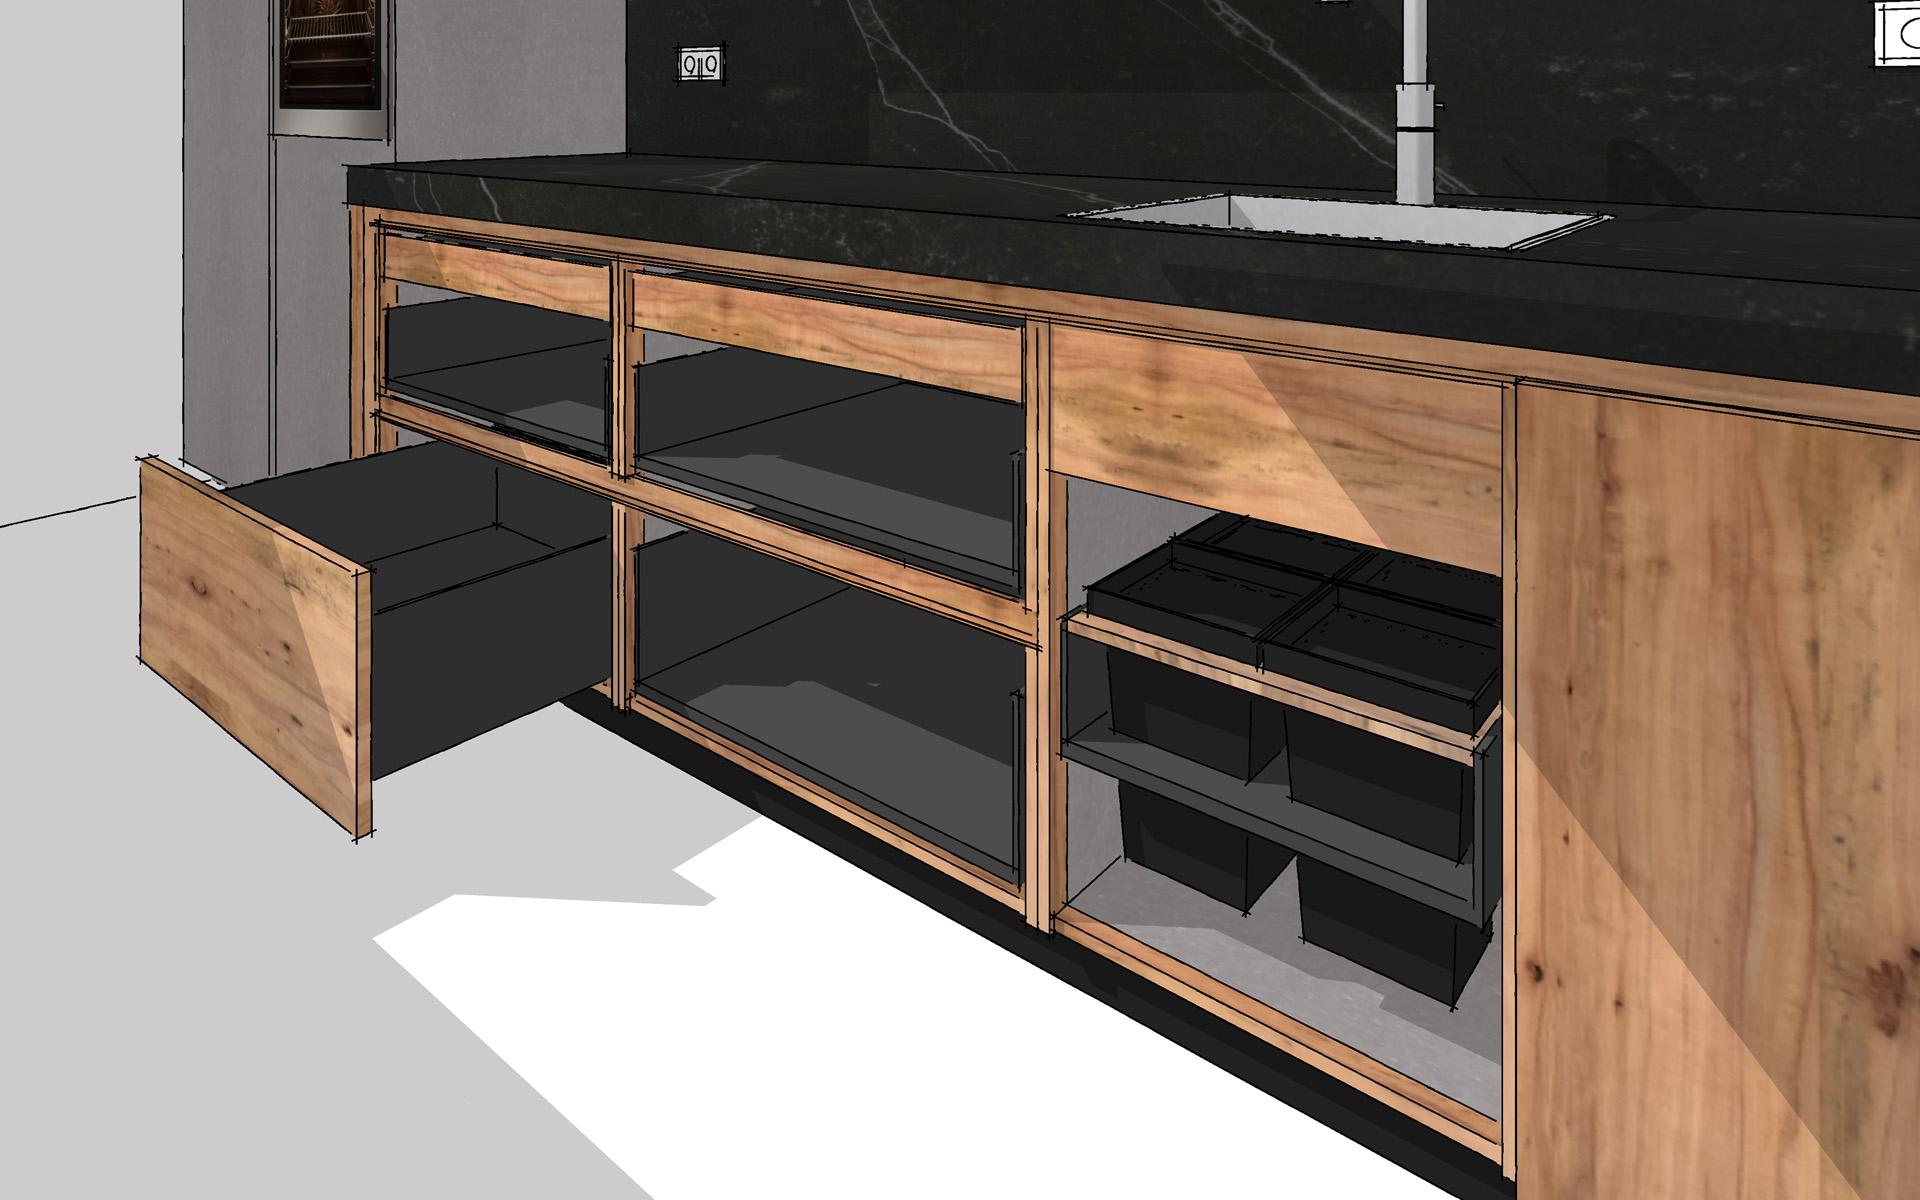 Keuken van appelhout te bovensmilde studio sool - Meubels studio keuken ...